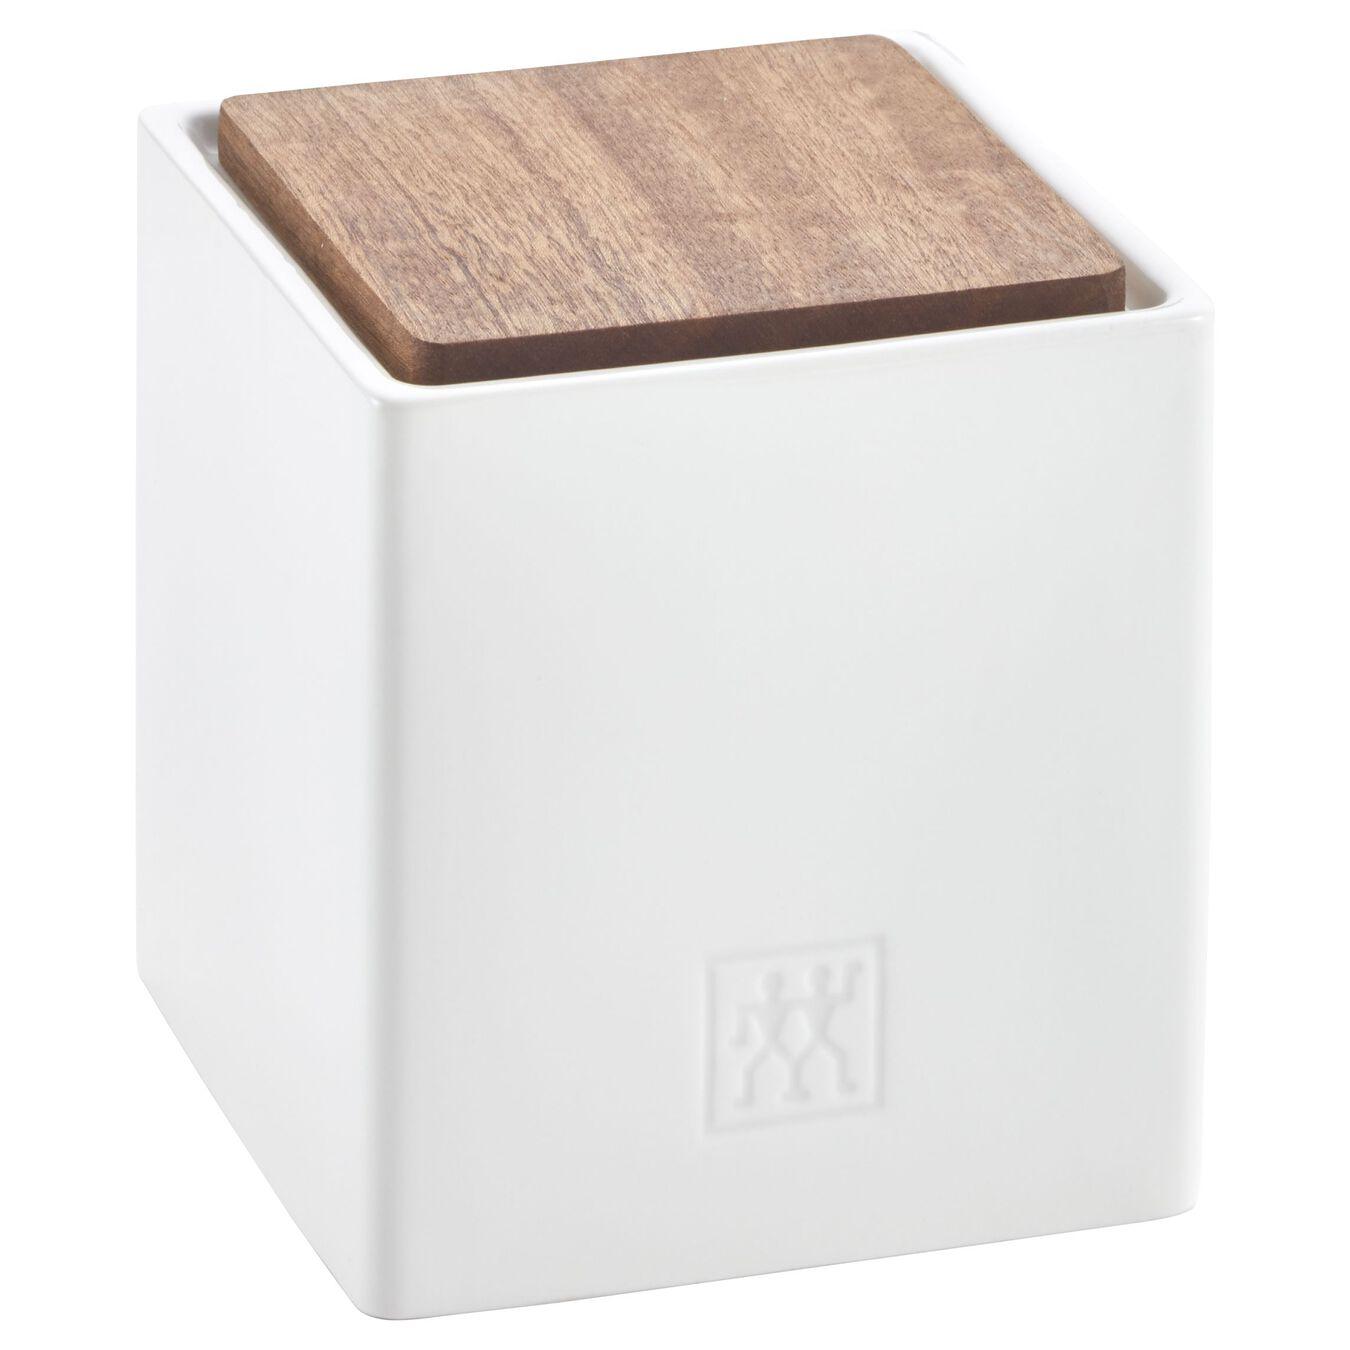 Aufbewahrungsgefäß Set, 4-tlg | Keramik,,large 7